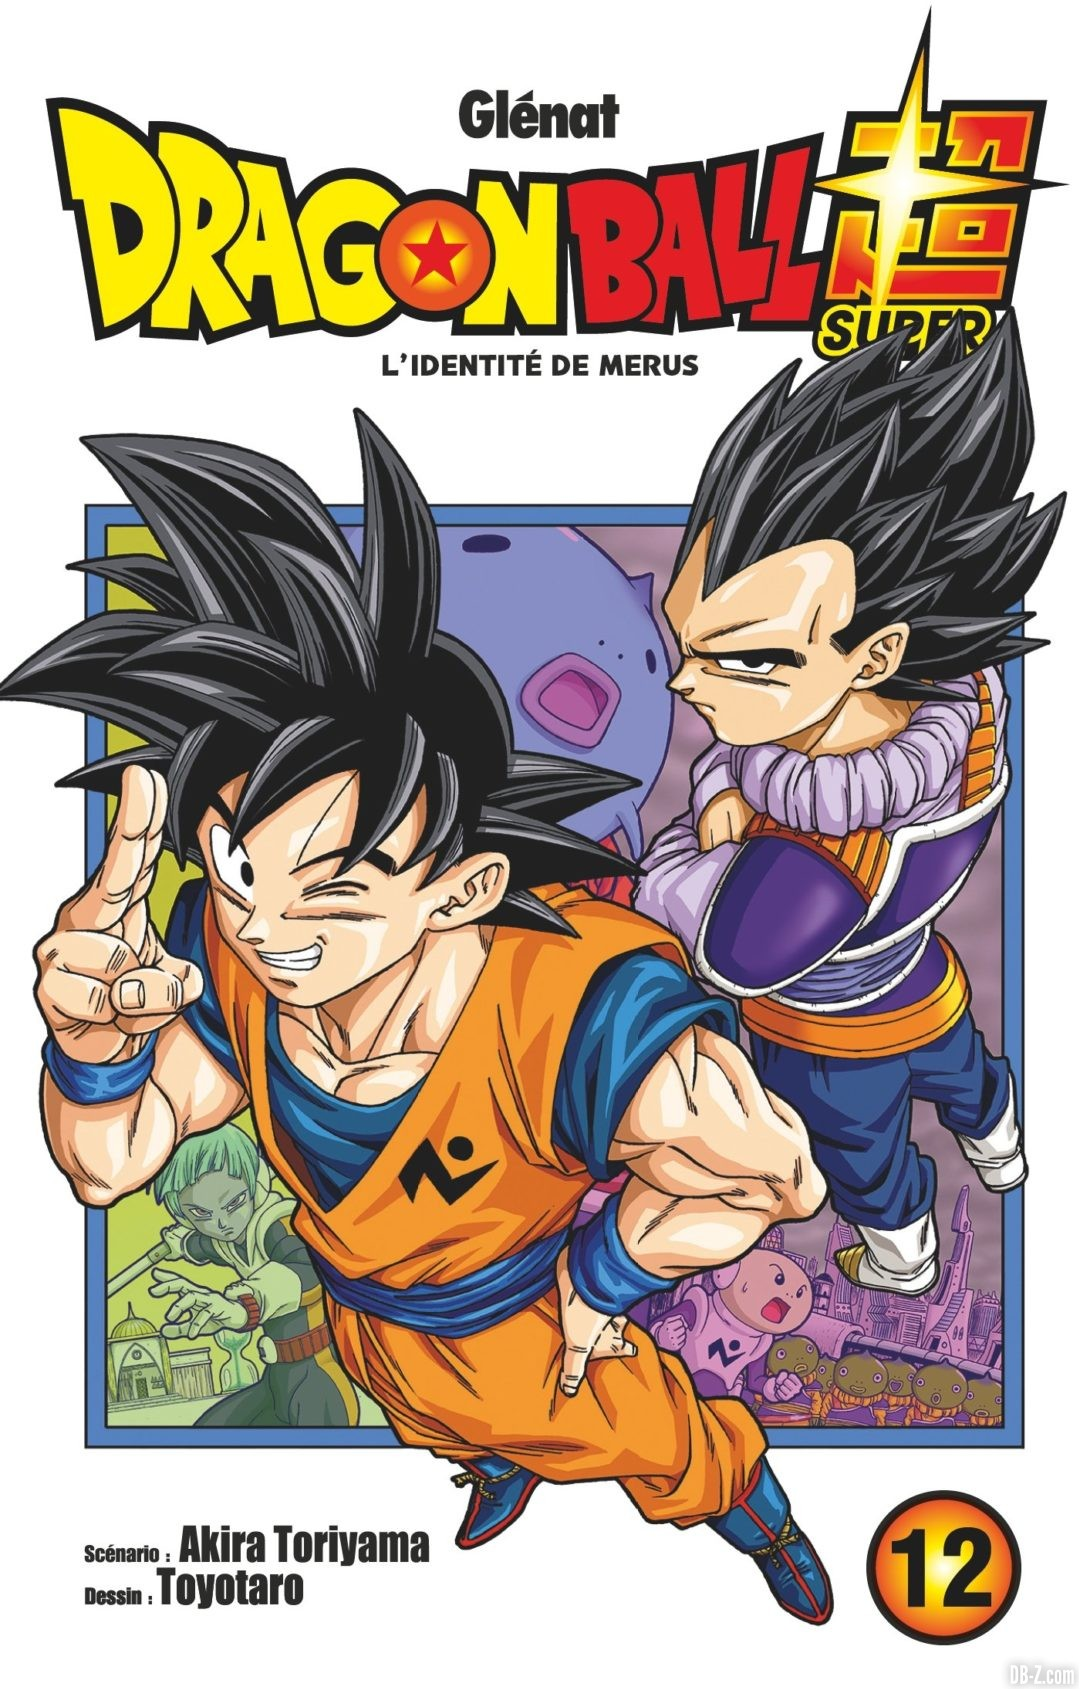 Couverture Tome 12 de Dragon Ball Super en VF